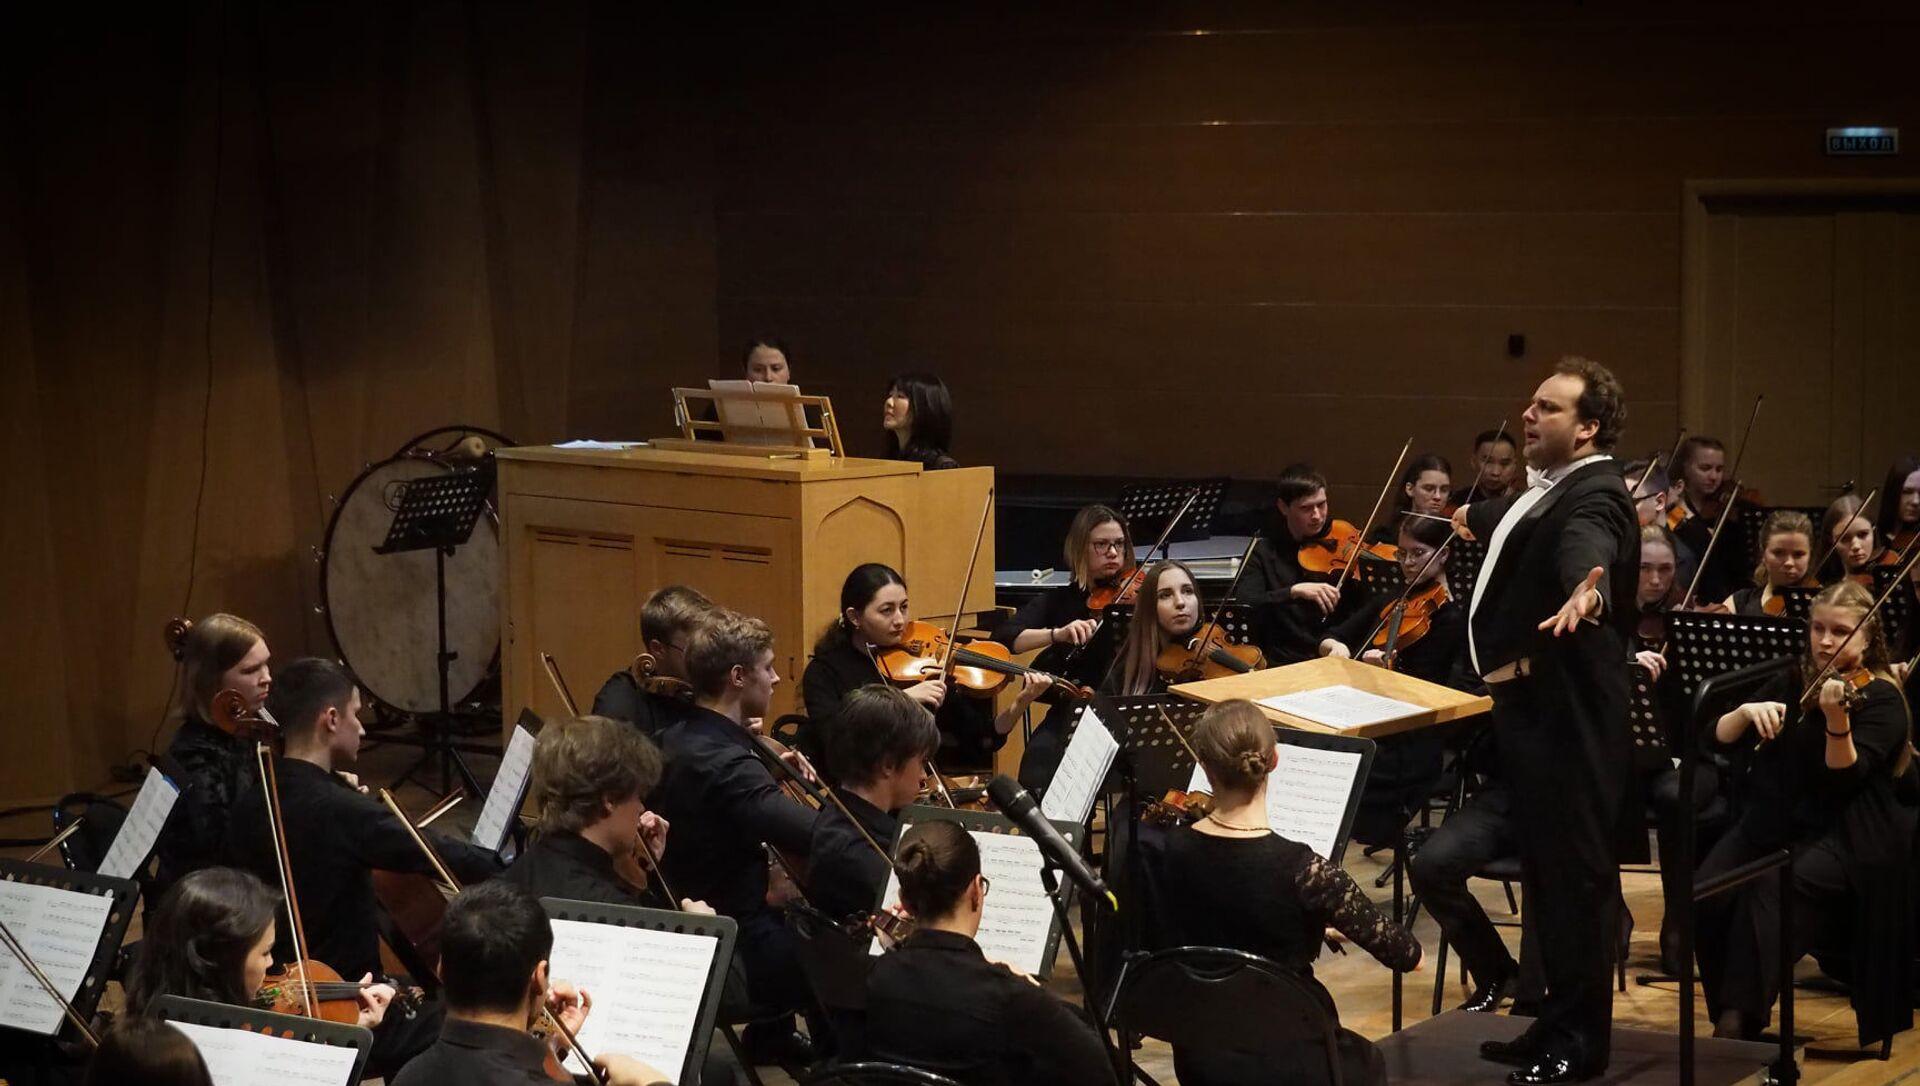 Petrozavodsk State Glazunov Conservatoire - Sputnik 日本, 1920, 09.03.2021